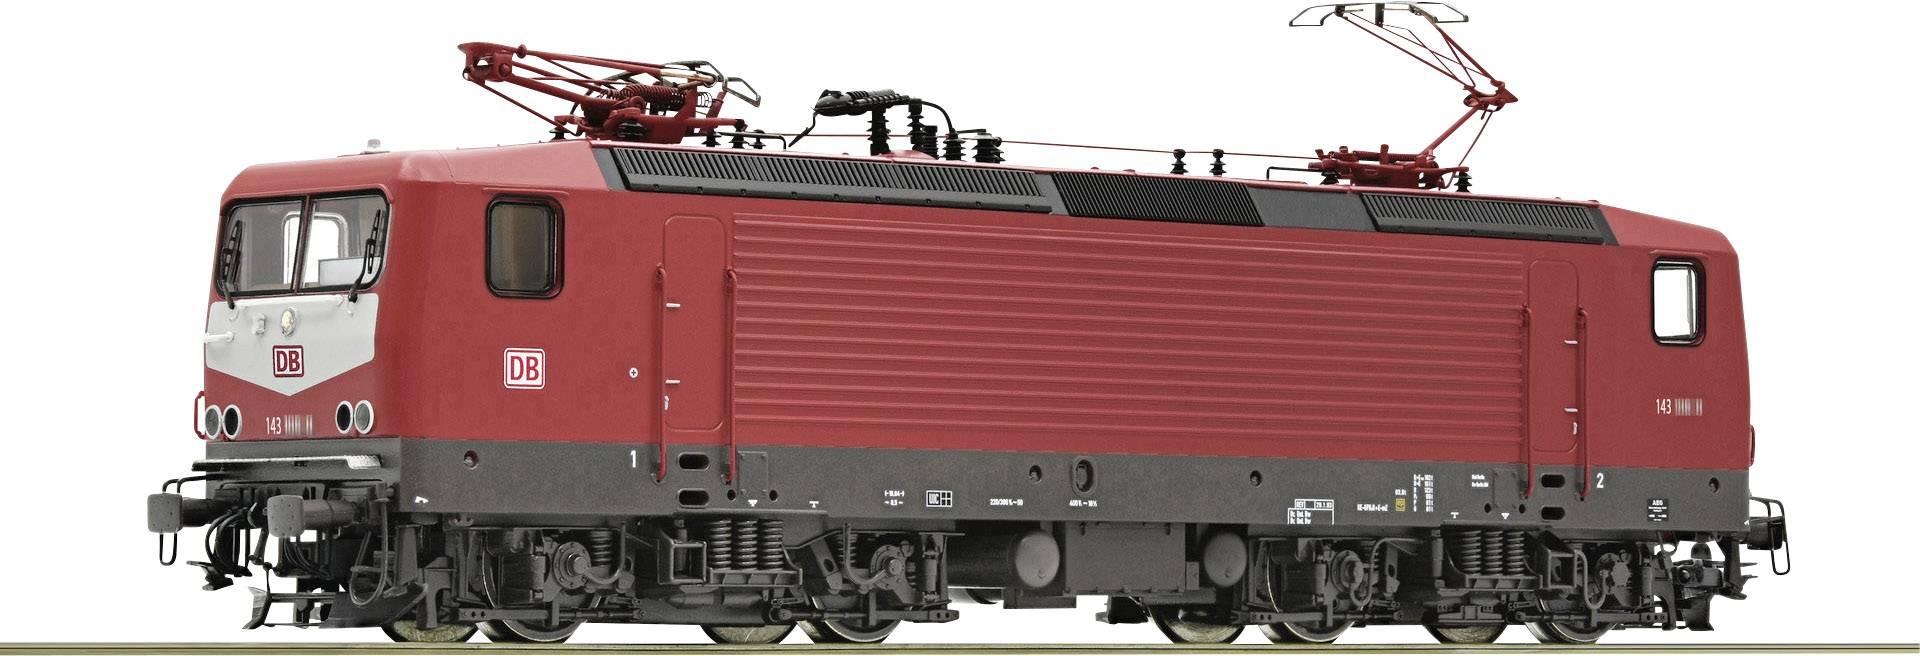 Roco 73334 Locomotiva elettric